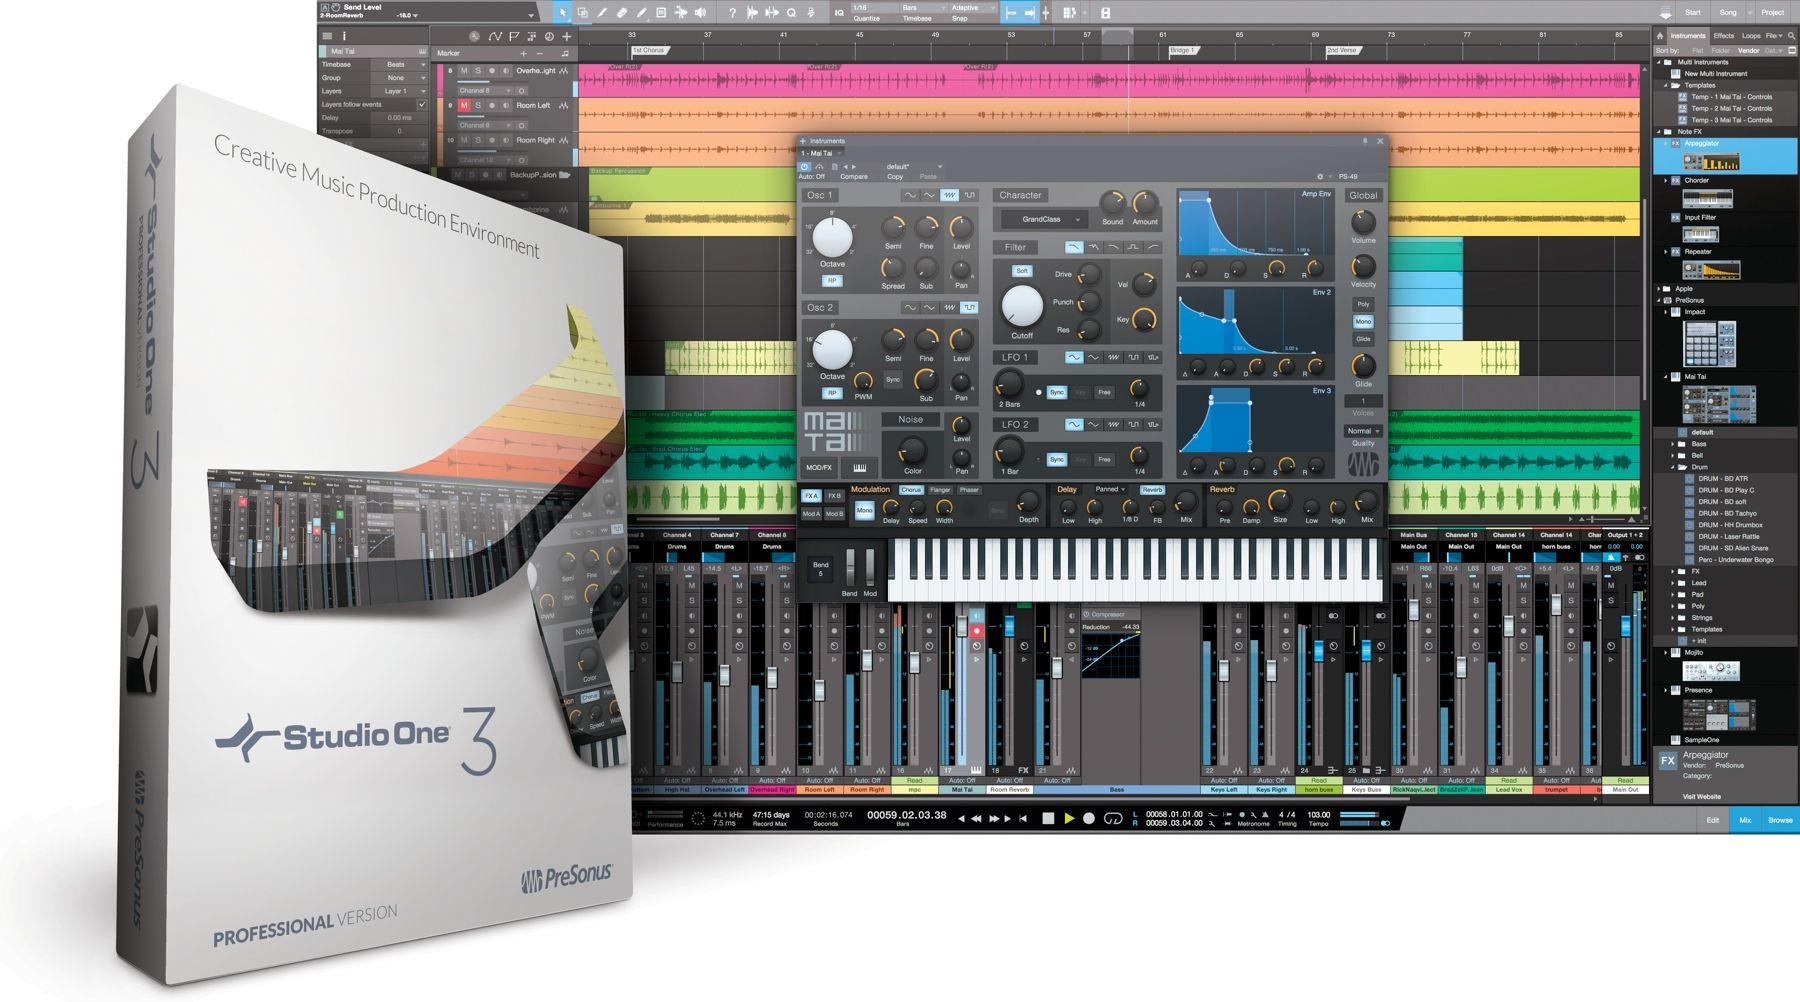 Presonus studio one 35 professional download digital